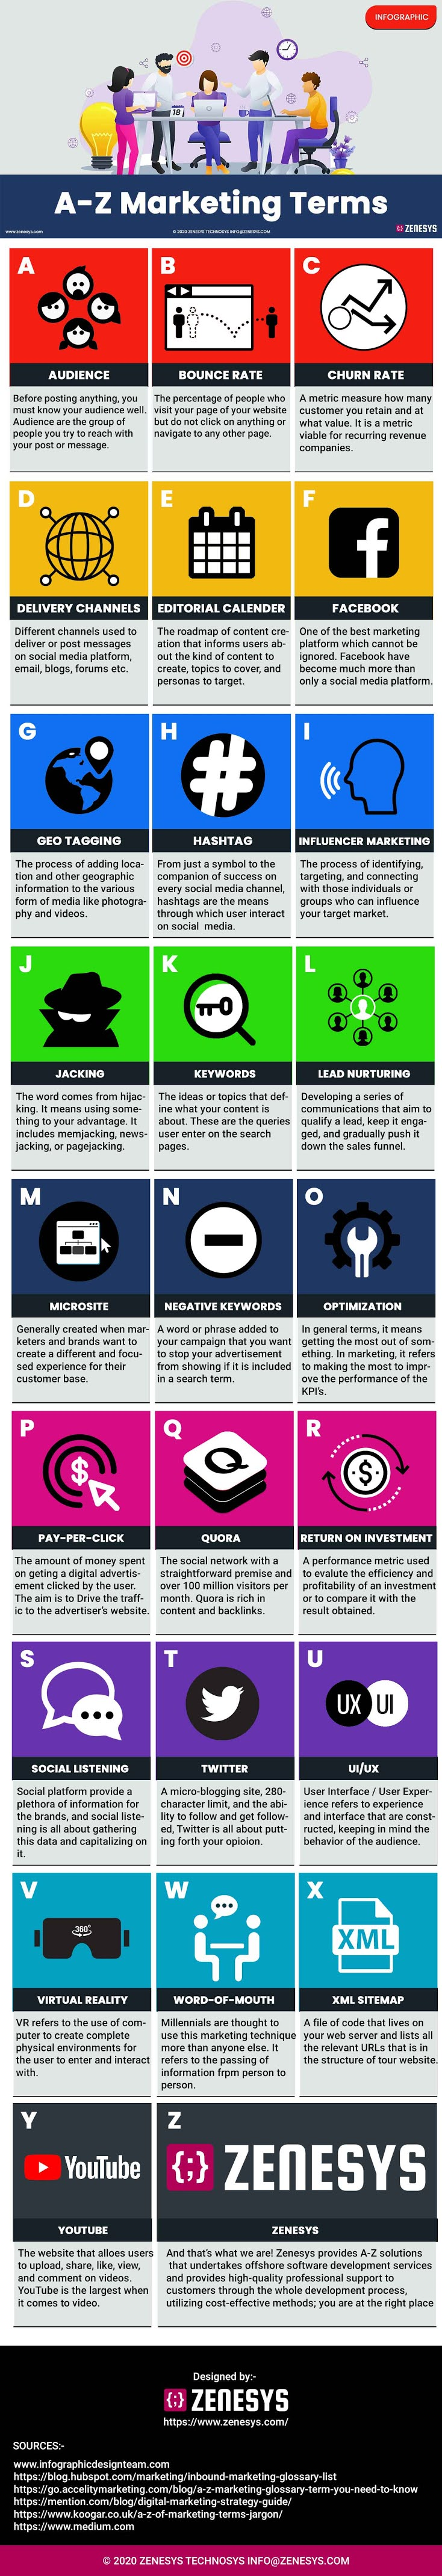 A-Z Marketing Terms #infographic #Business #Digital Marketing #Marketing